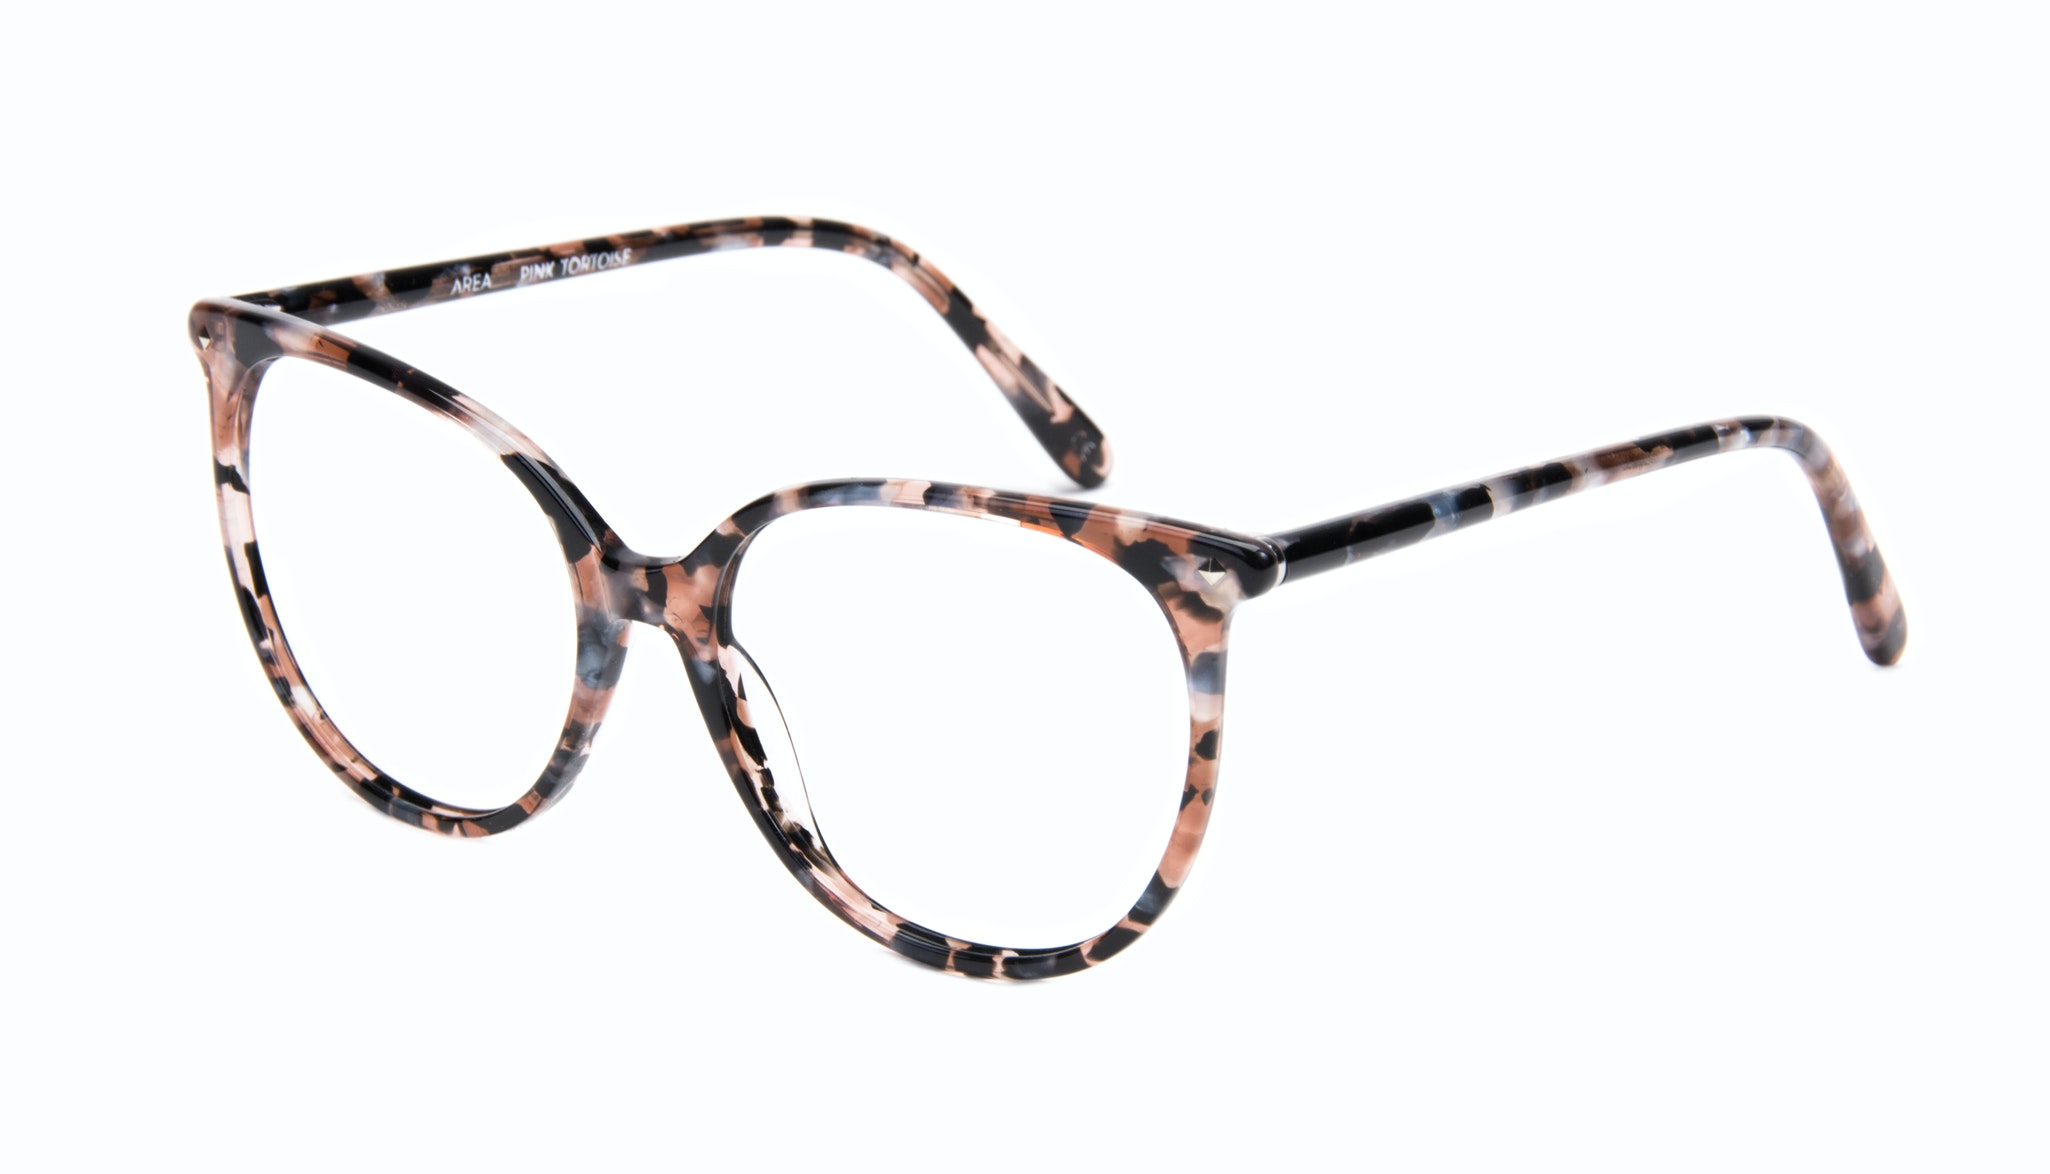 Affordable Fashion Glasses Cat Eye Square Eyeglasses Women Area Pink Tortoise Tilt